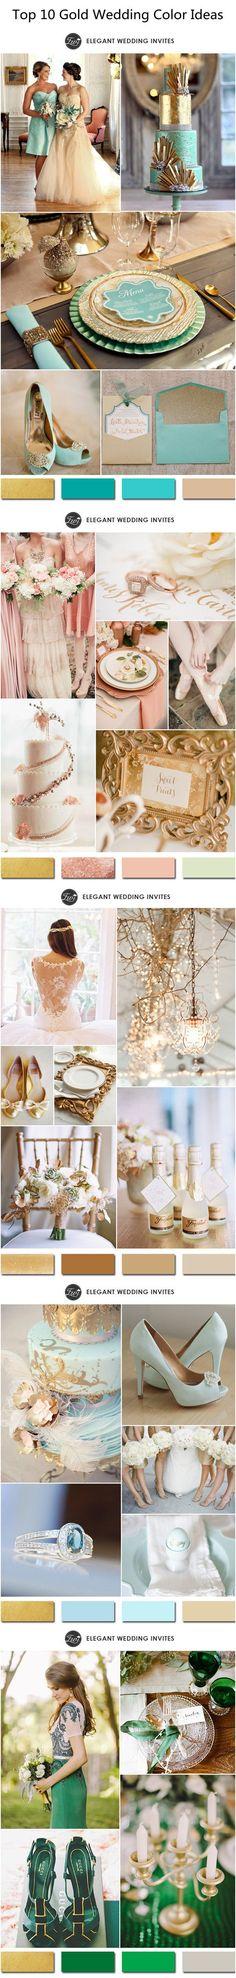 Top 10 Gold Wedding Color Ideas 2015 Trends #weddingcolors #elegantweddinginvites